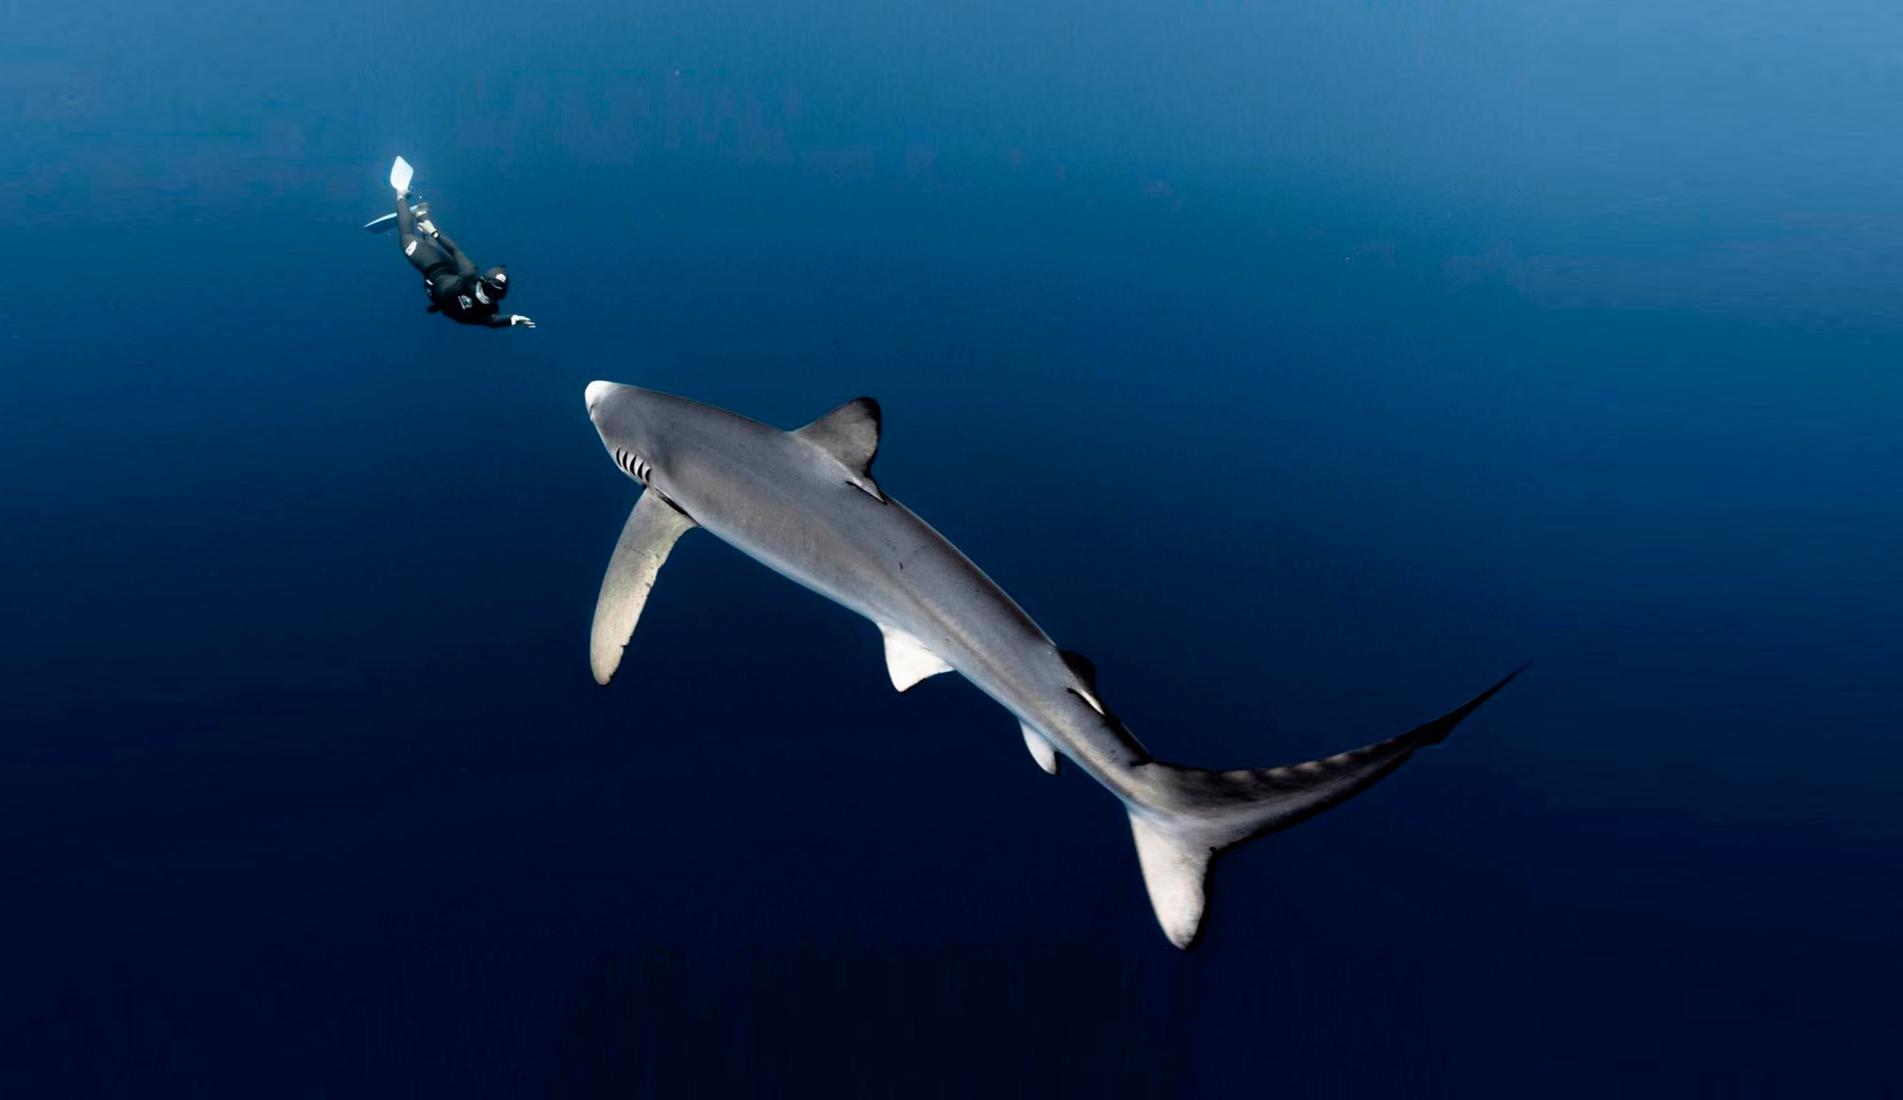 fotos-adrenalina-watersports-20